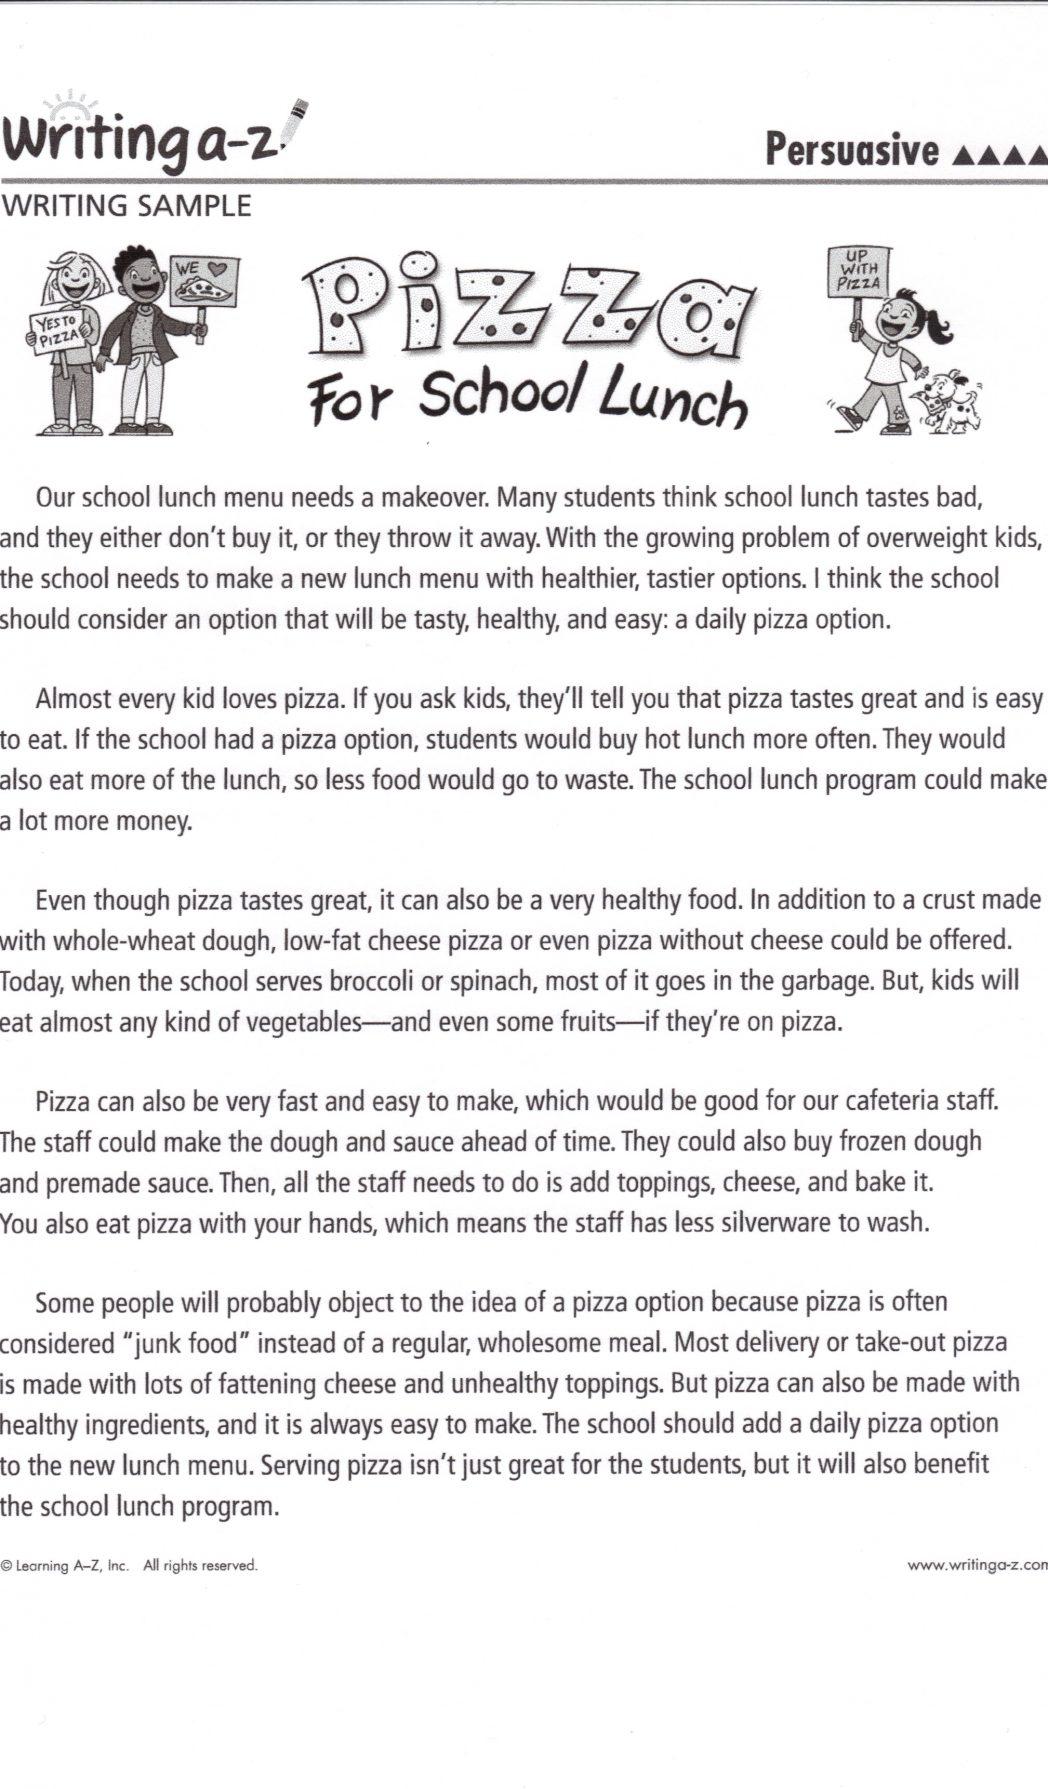 016 Healthy Eating Essay Example High School Persuasive Topics Sample Essays Writing Article Argumentative Impressive Spm Habits Pdf Full